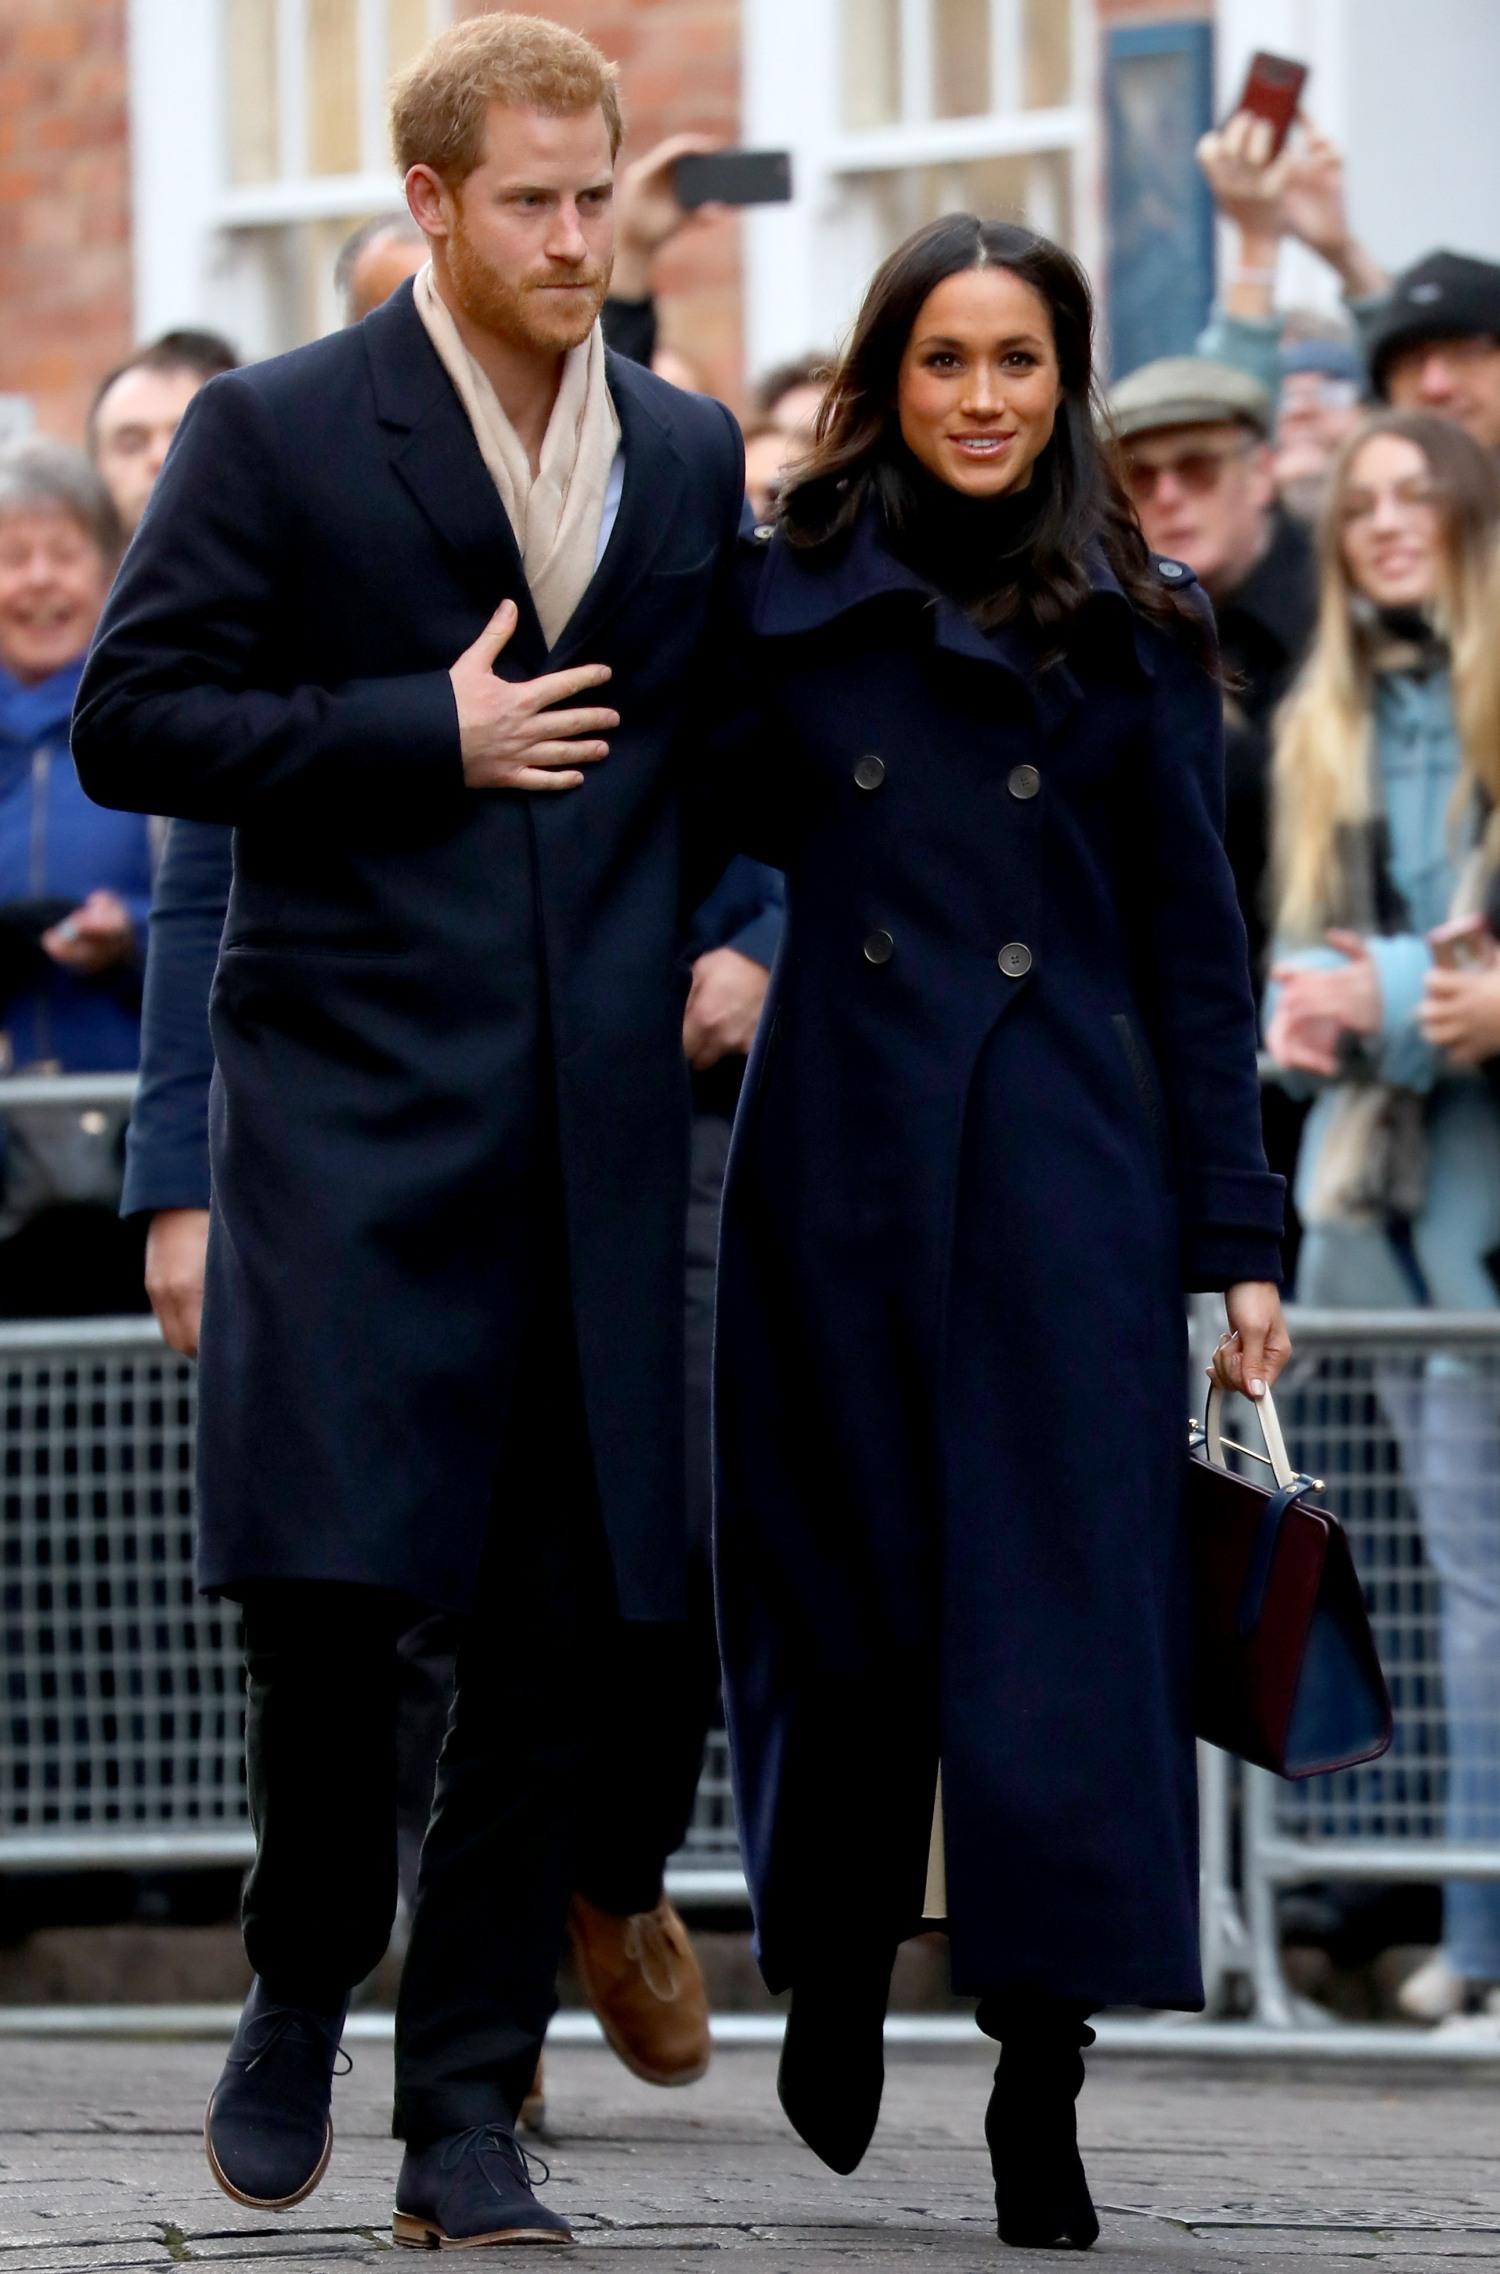 Prince Harry and Meghan Markle visit Nottingham